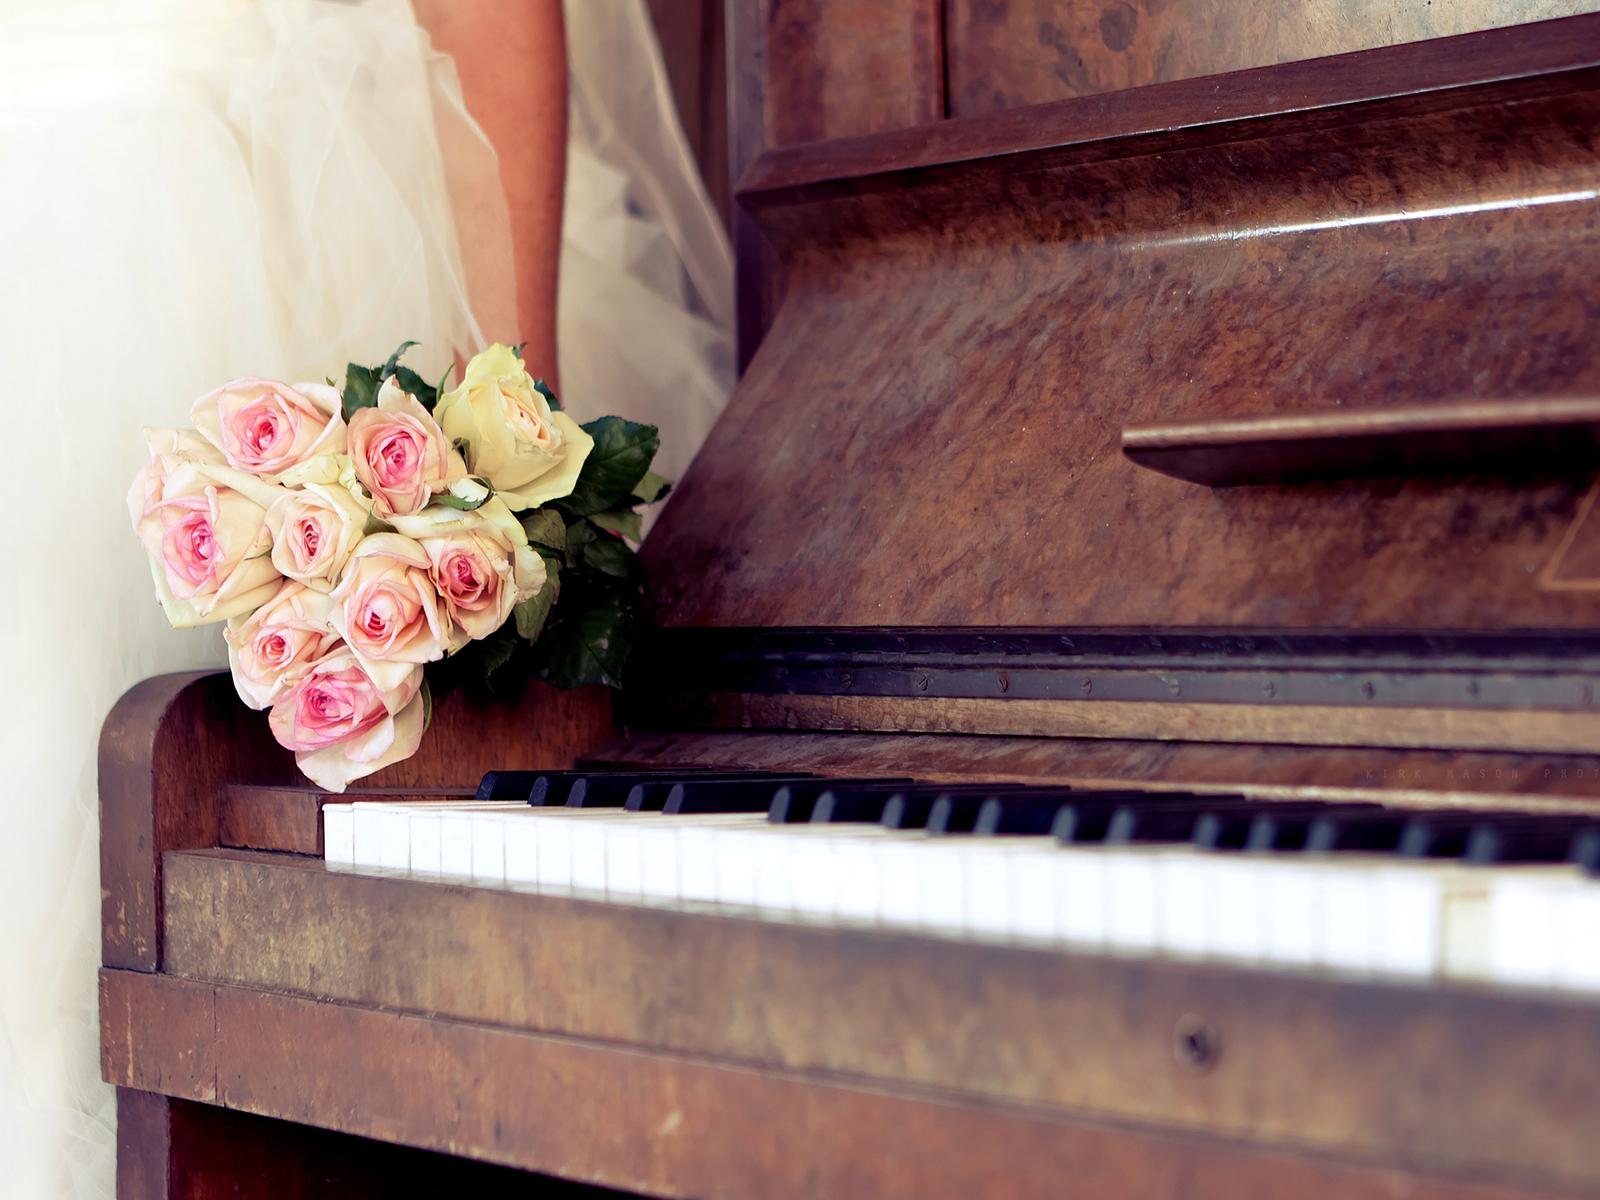 http://4.bp.blogspot.com/--QZEq0Slzbk/UBknWKLOJjI/AAAAAAAADTQ/314gCmTMEk8/s1600/Vintage_Piano_and_A_Bouquet_Pink_Roses_HD_Desktop_Wallpaper-HidefWall.Blogspot.Com-jpg.jpg